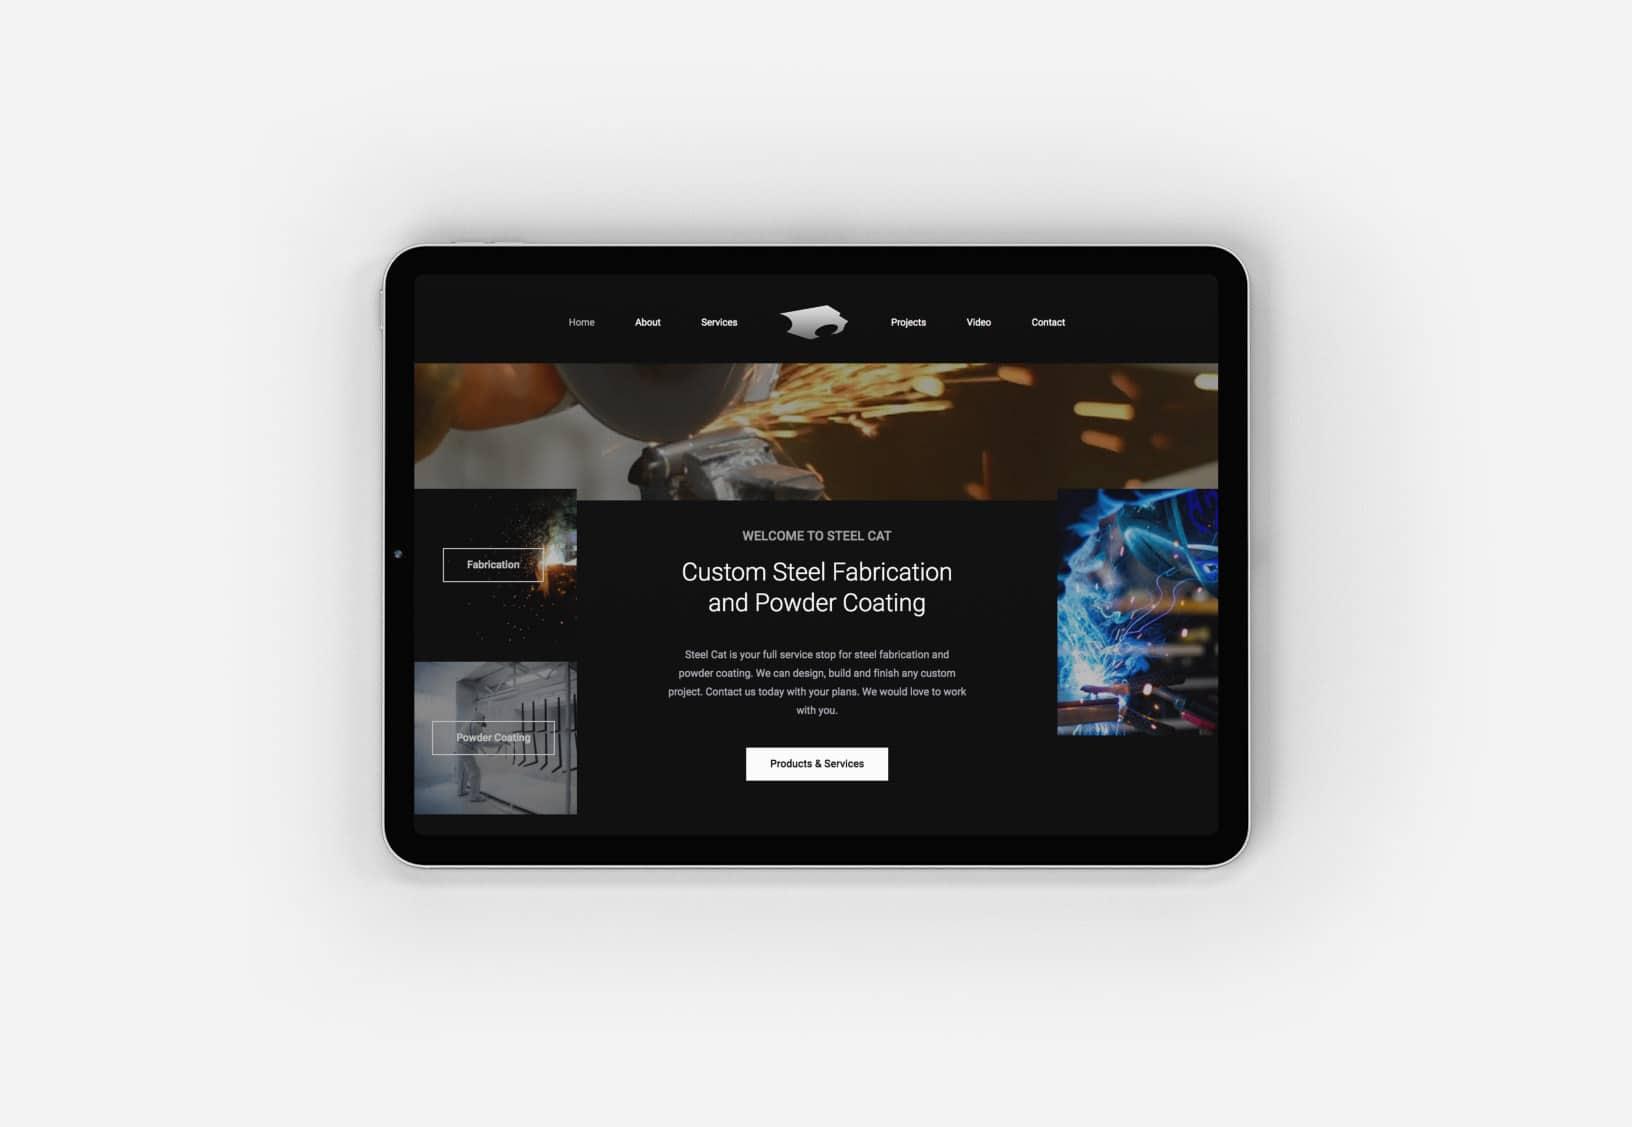 Fire Source Media - Web Development, SEO, Digital Marketing